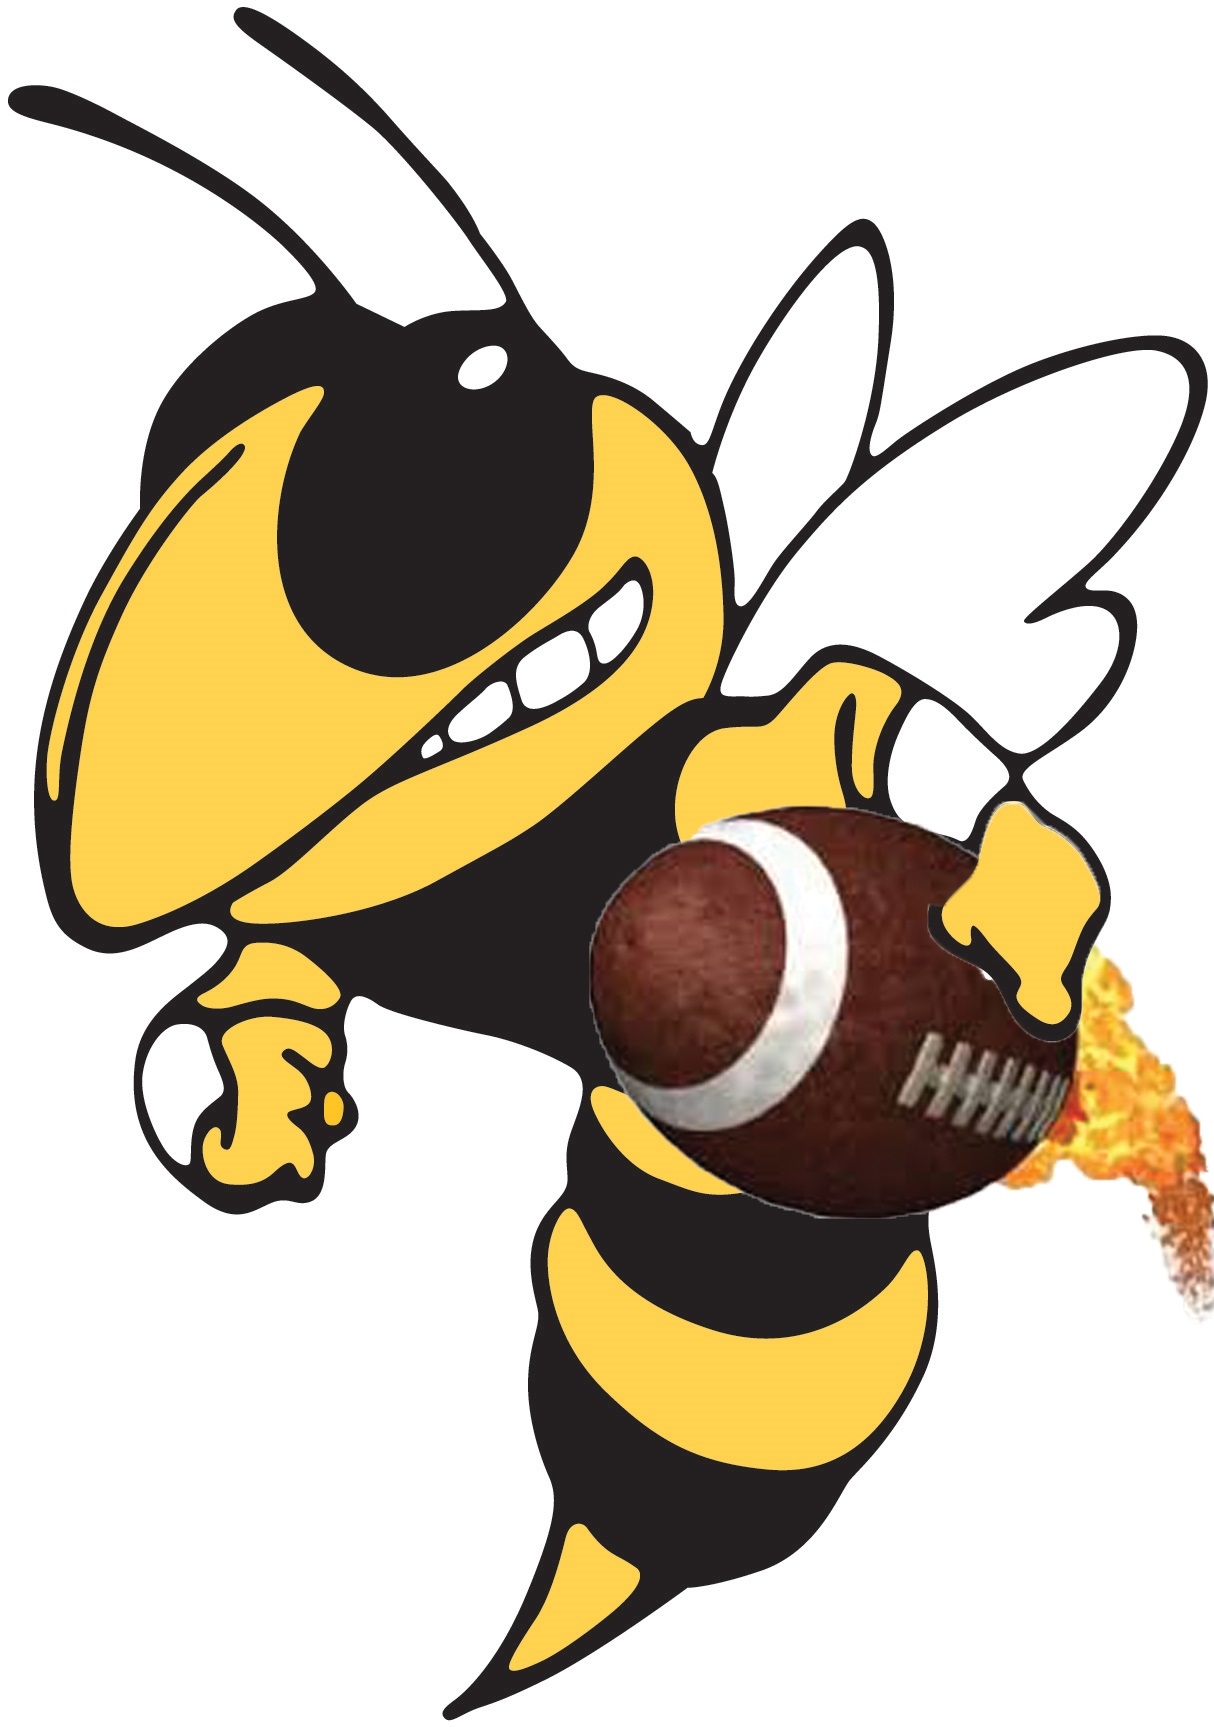 three rivers local school district resources Yellow Jacket Mascot Baseball Clayton Yellow Jacket Mascot Clip Art